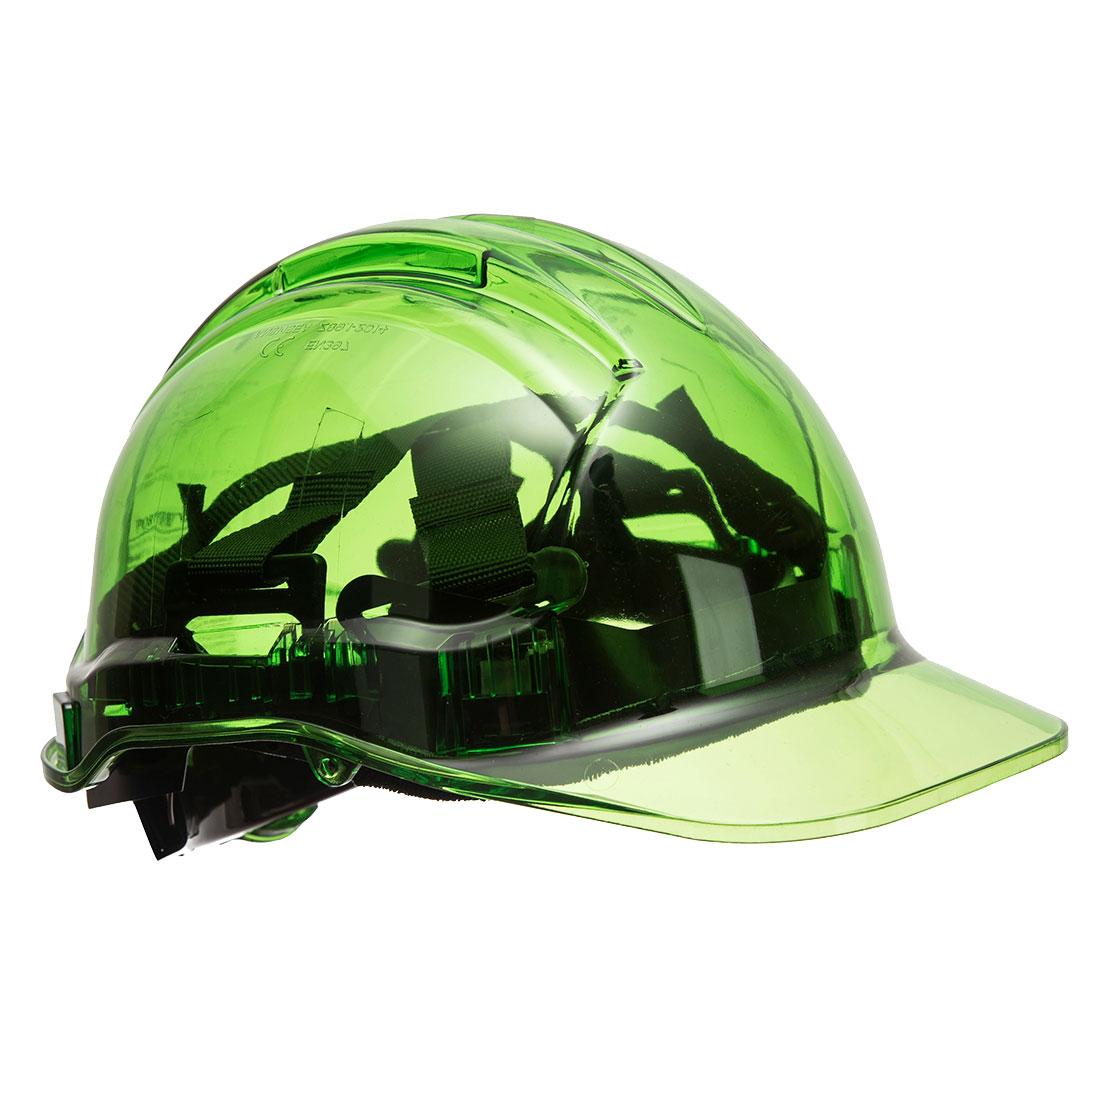 Portwest PV64 Translucent Peak View Ratchet Hard Hat, Green  R/Fit